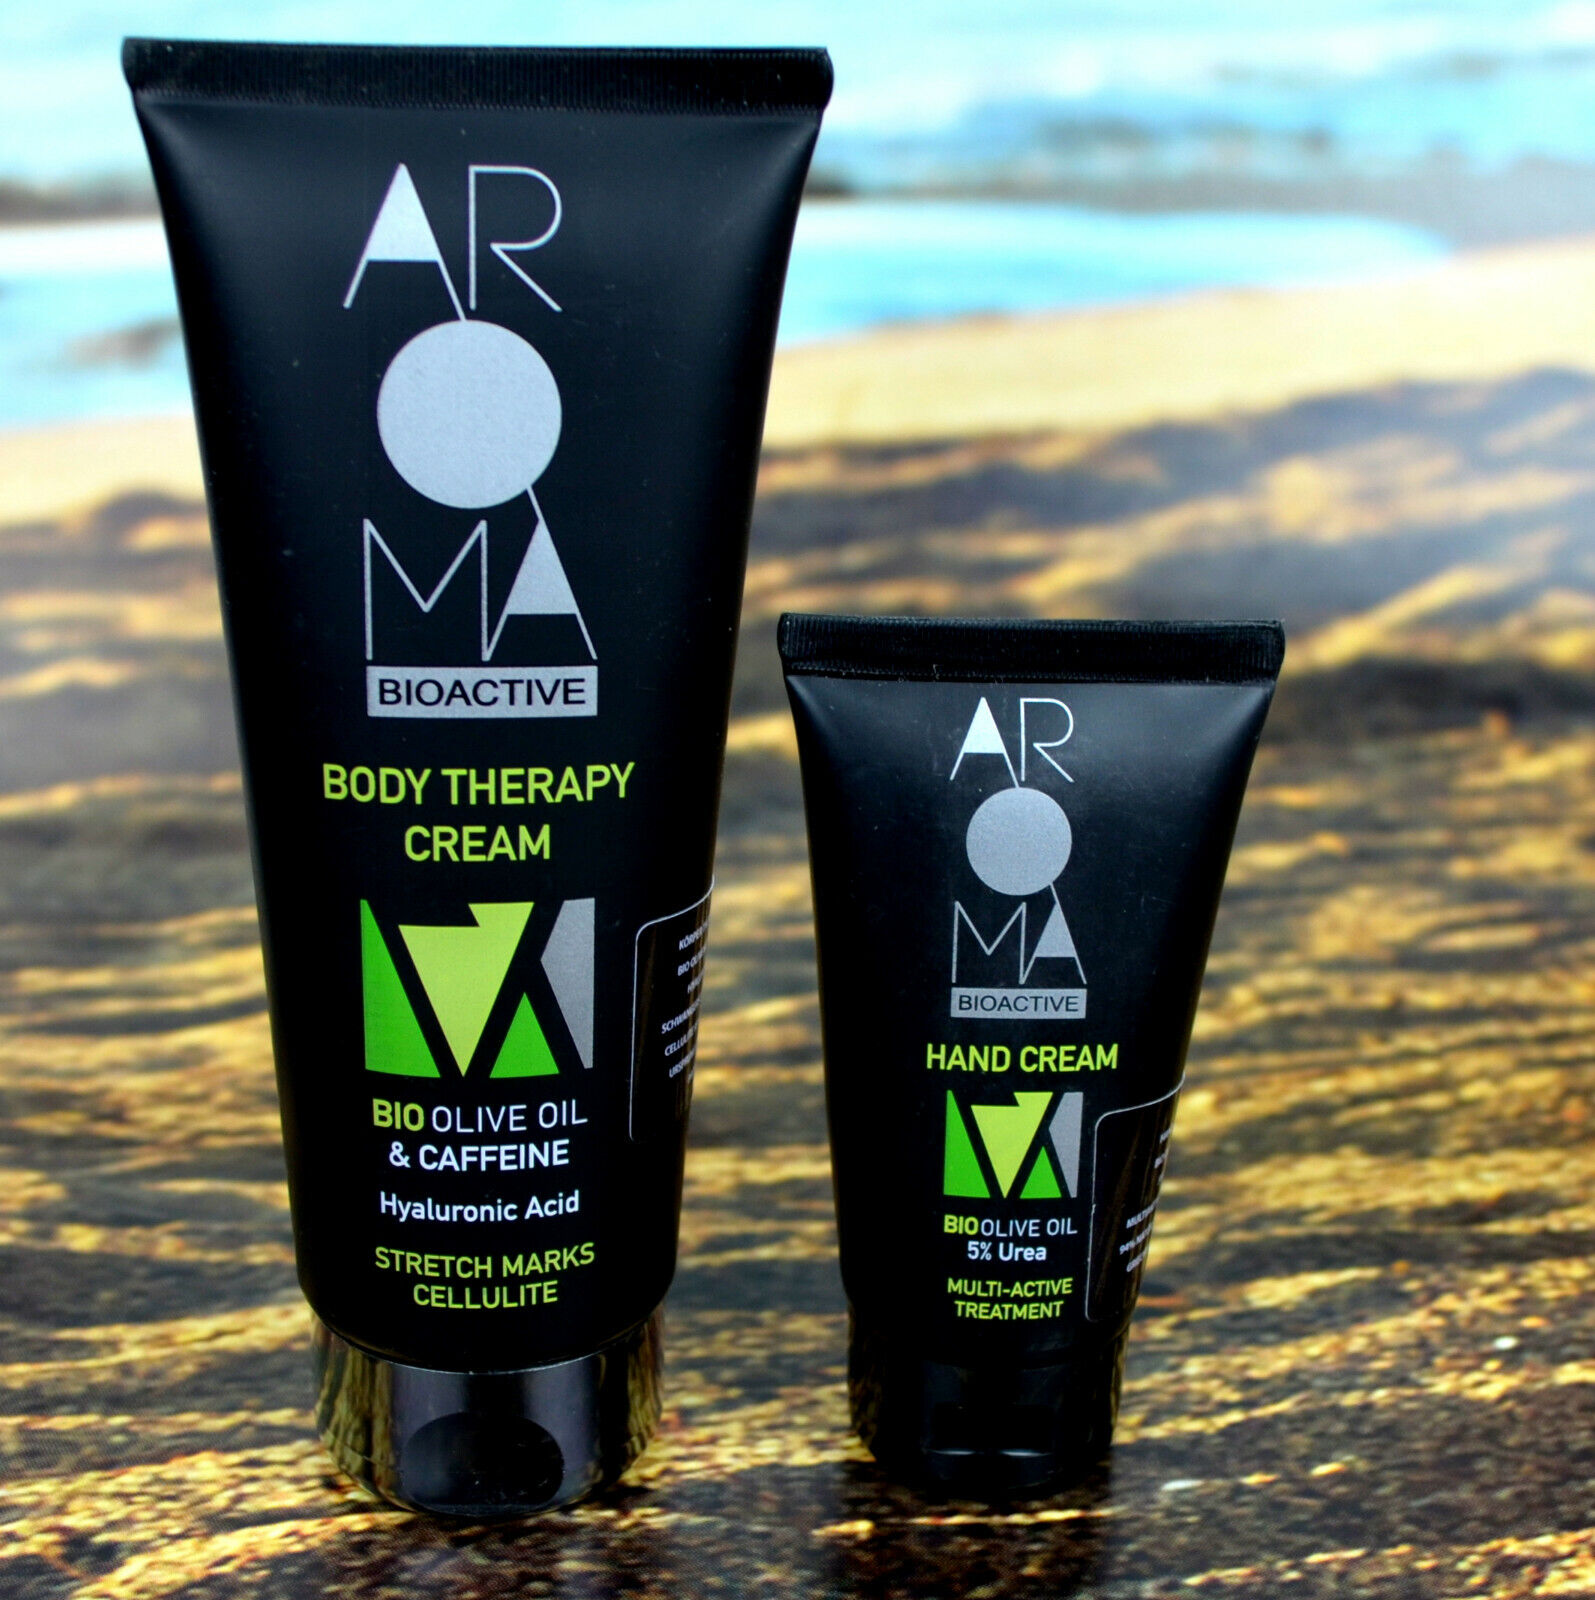 Körper  Creme Bio Oliven Öl & Koffein  Hand Creme 5% Urea  AROMA Bioaktive Oikos